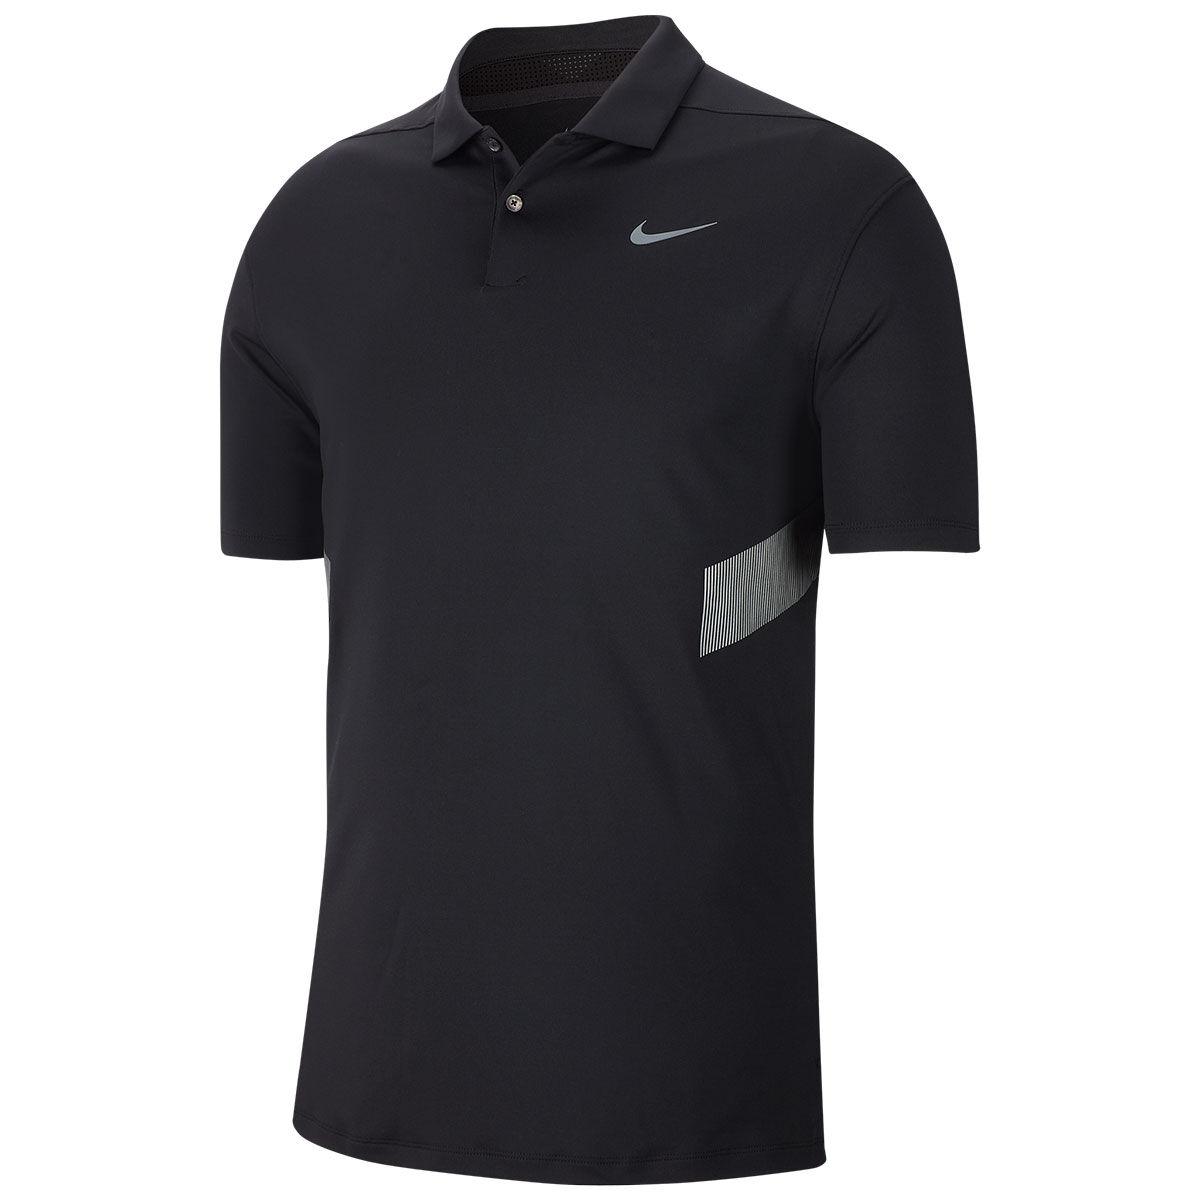 Nike Golf Dri-FIT Vapor Reflect Polo